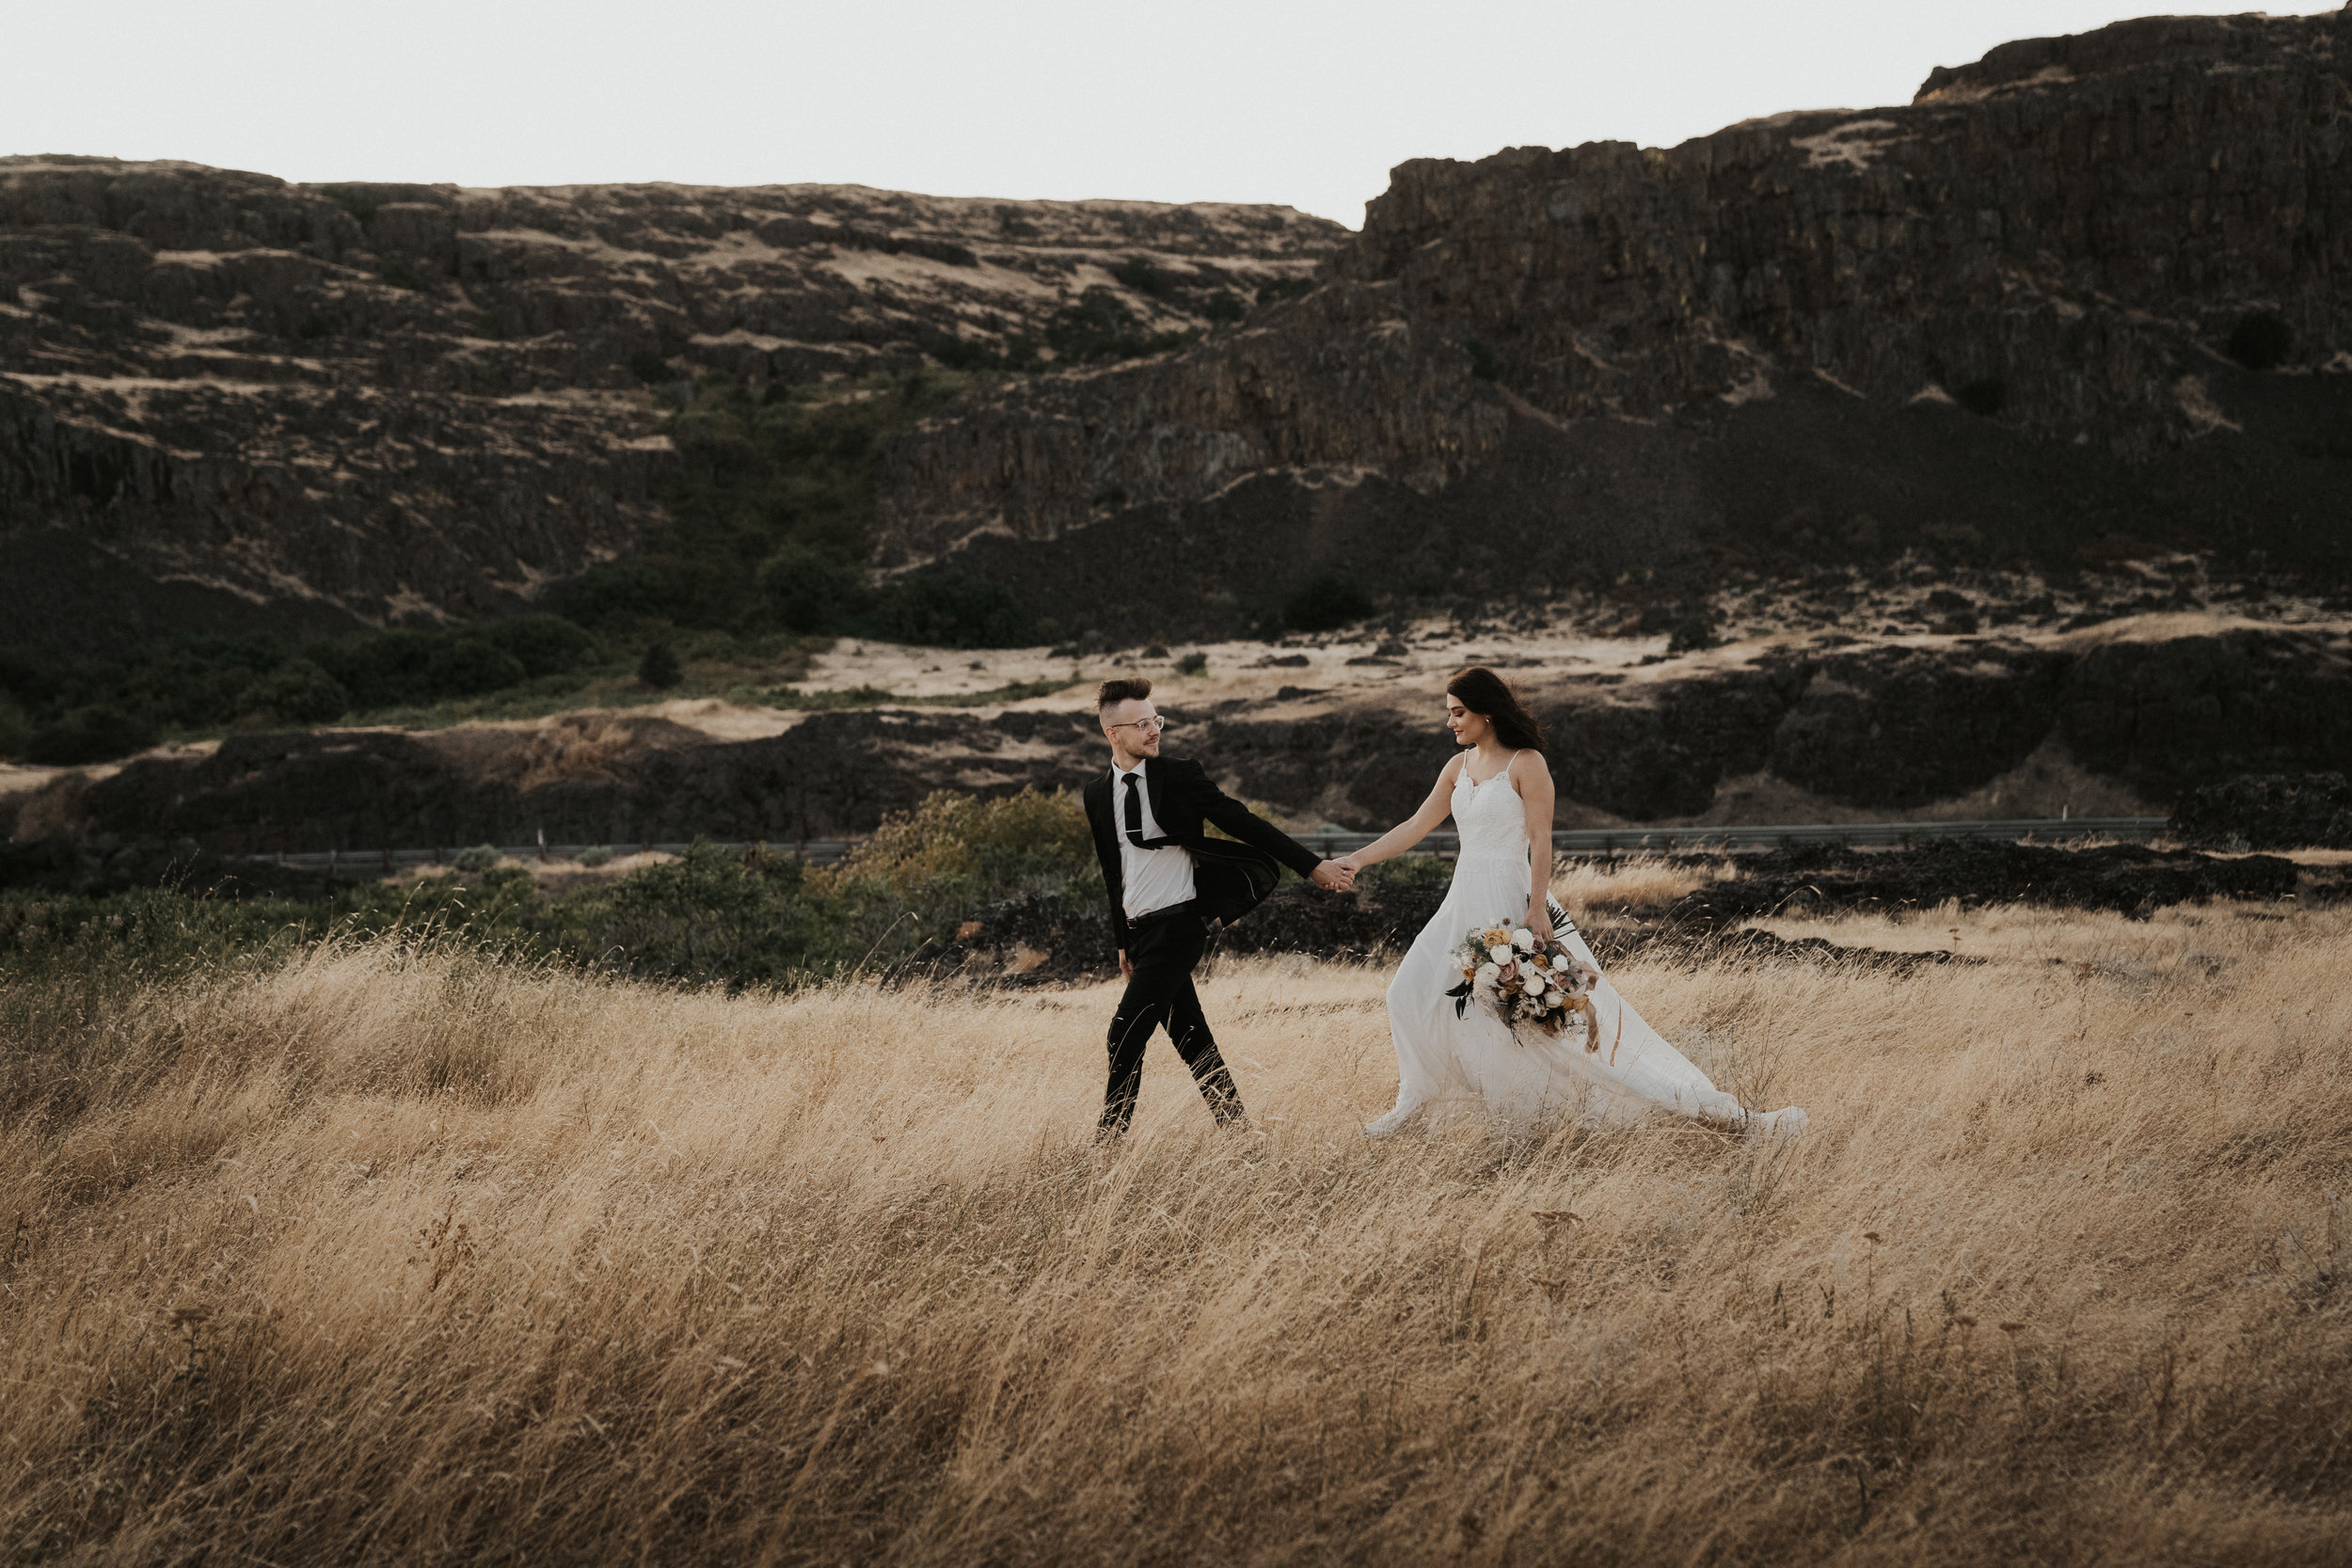 columbia-river-gorge-wedding-elopement-inspiration-12.jpg